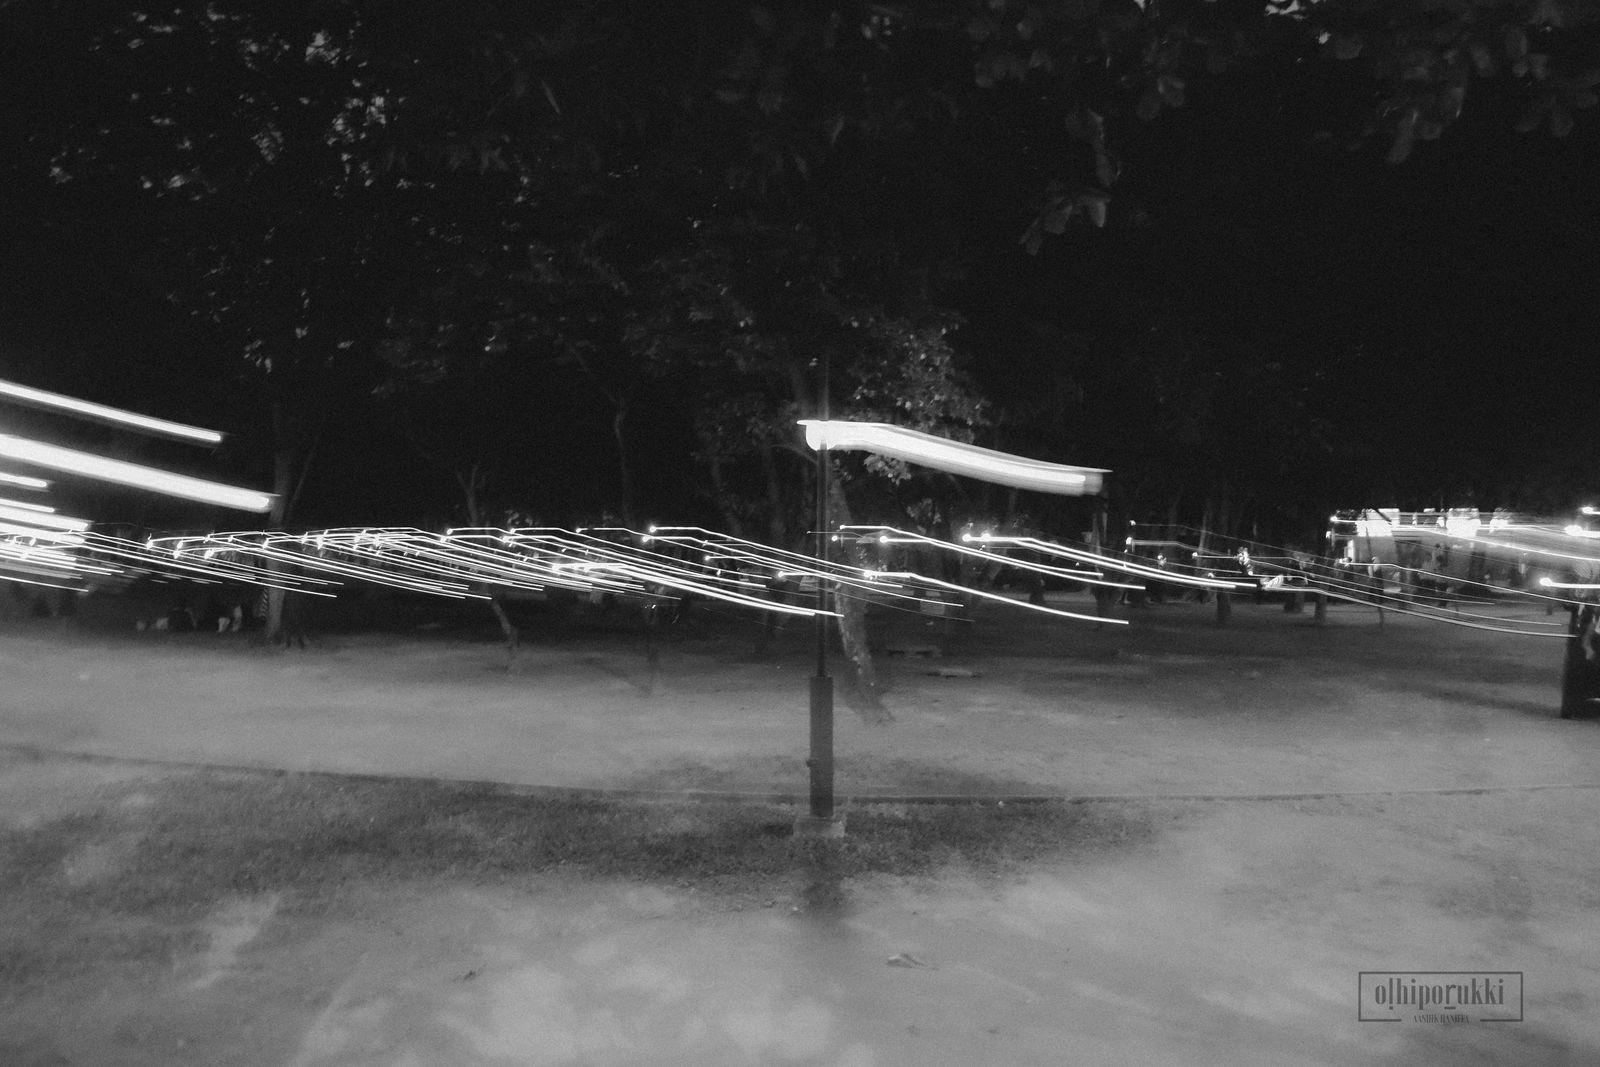 Fadedmoments #Faded #fadedmoments #Fadednights #Light & Shadow #lightart #Night Absence Color Empty Illuminated Night No People Outdoors Shade The Way Forward Tree